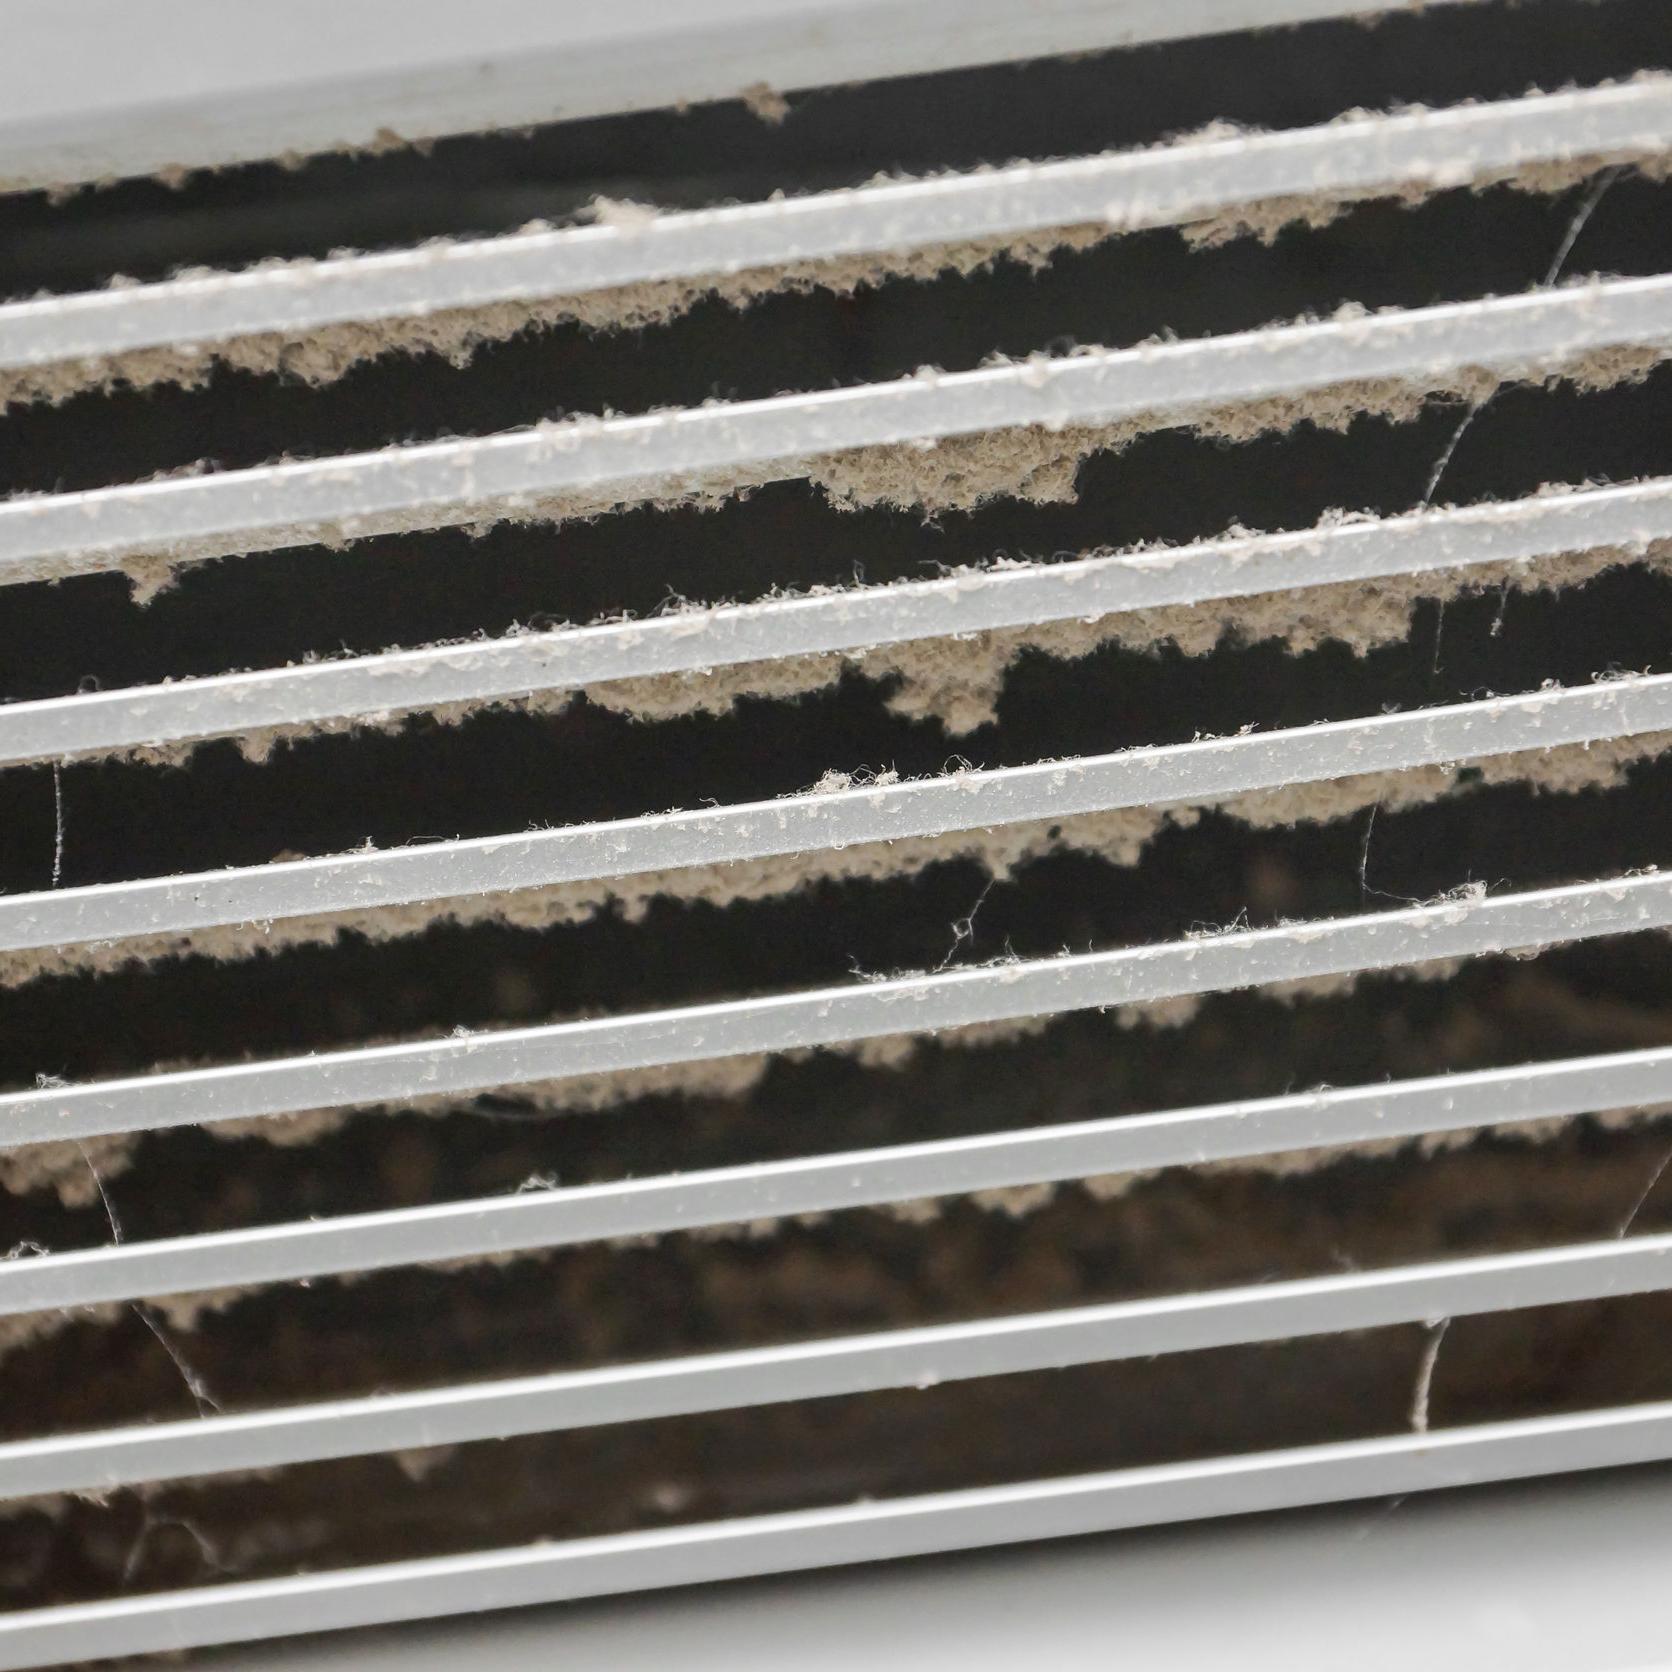 Dusty air vent